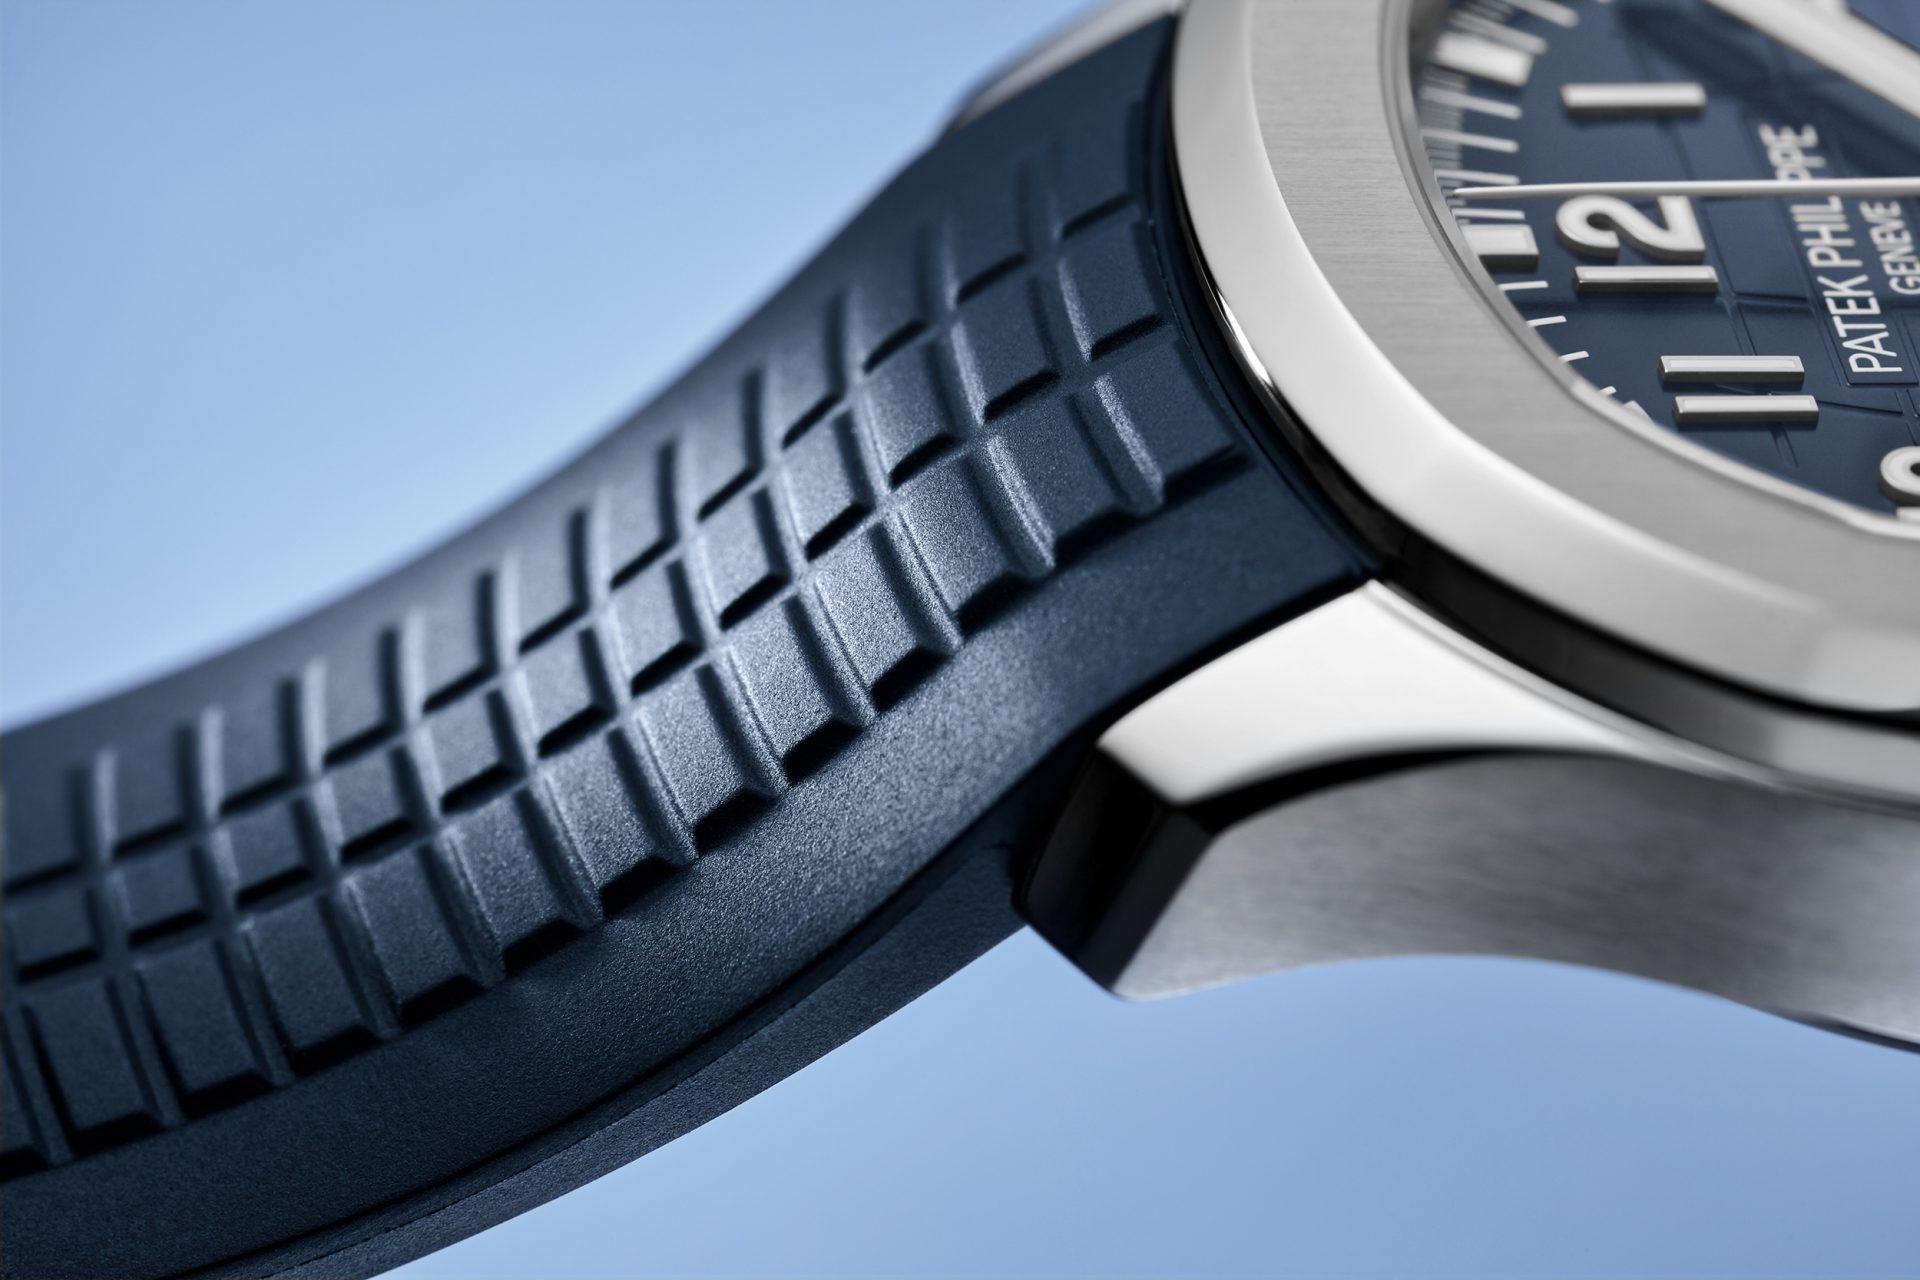 Aquanaut Cronografo oro blanco azul